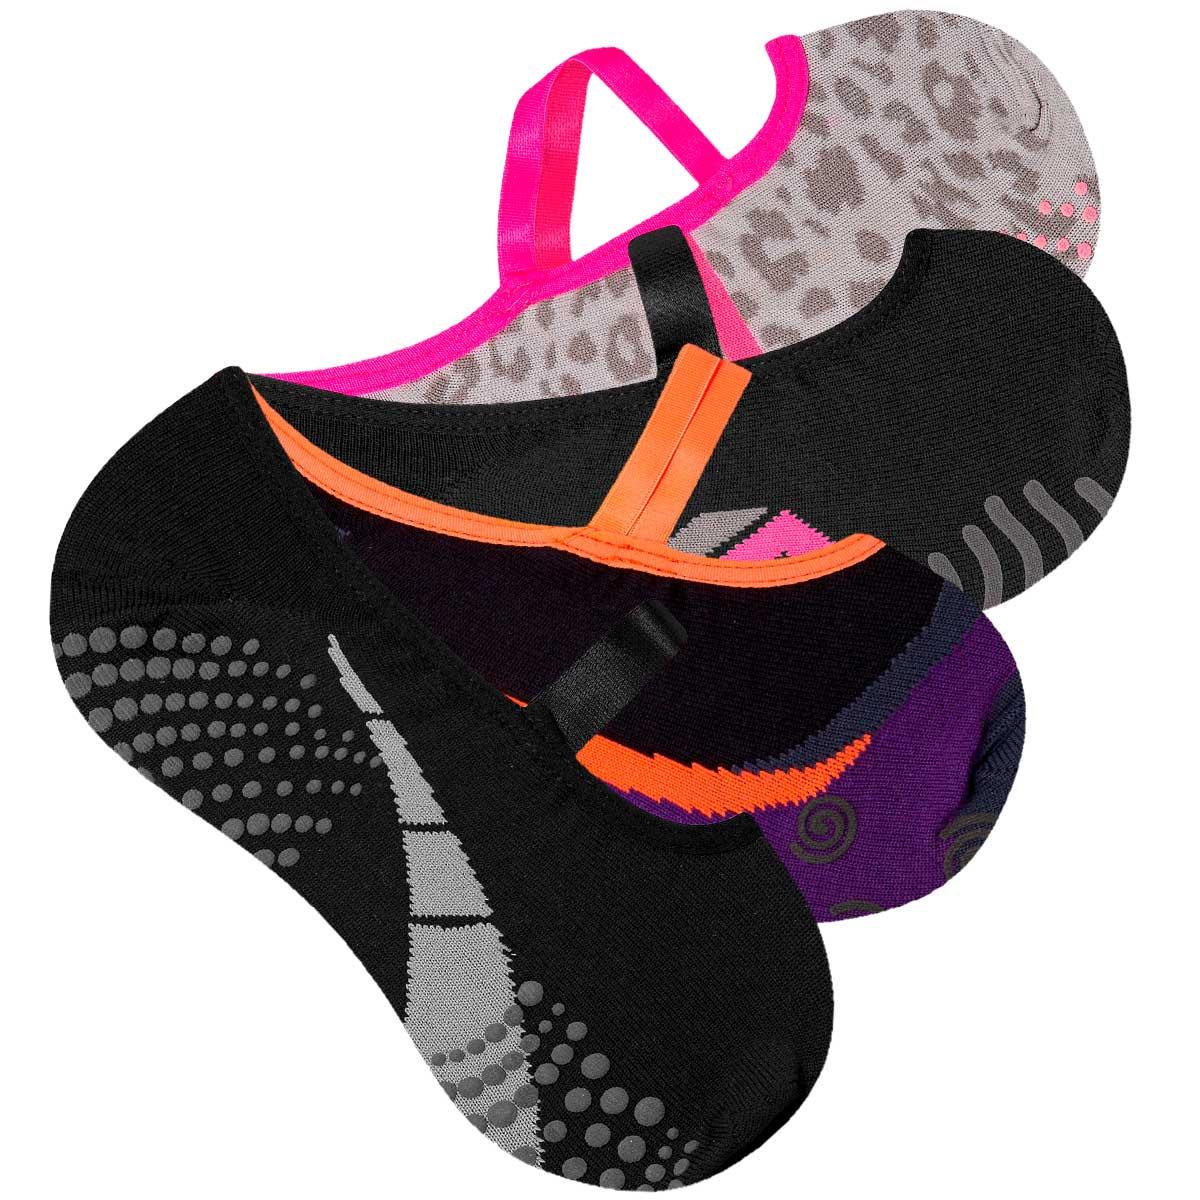 kit 4 Meias Sapatilha Pilates Antiderrapante Feminina Yoga